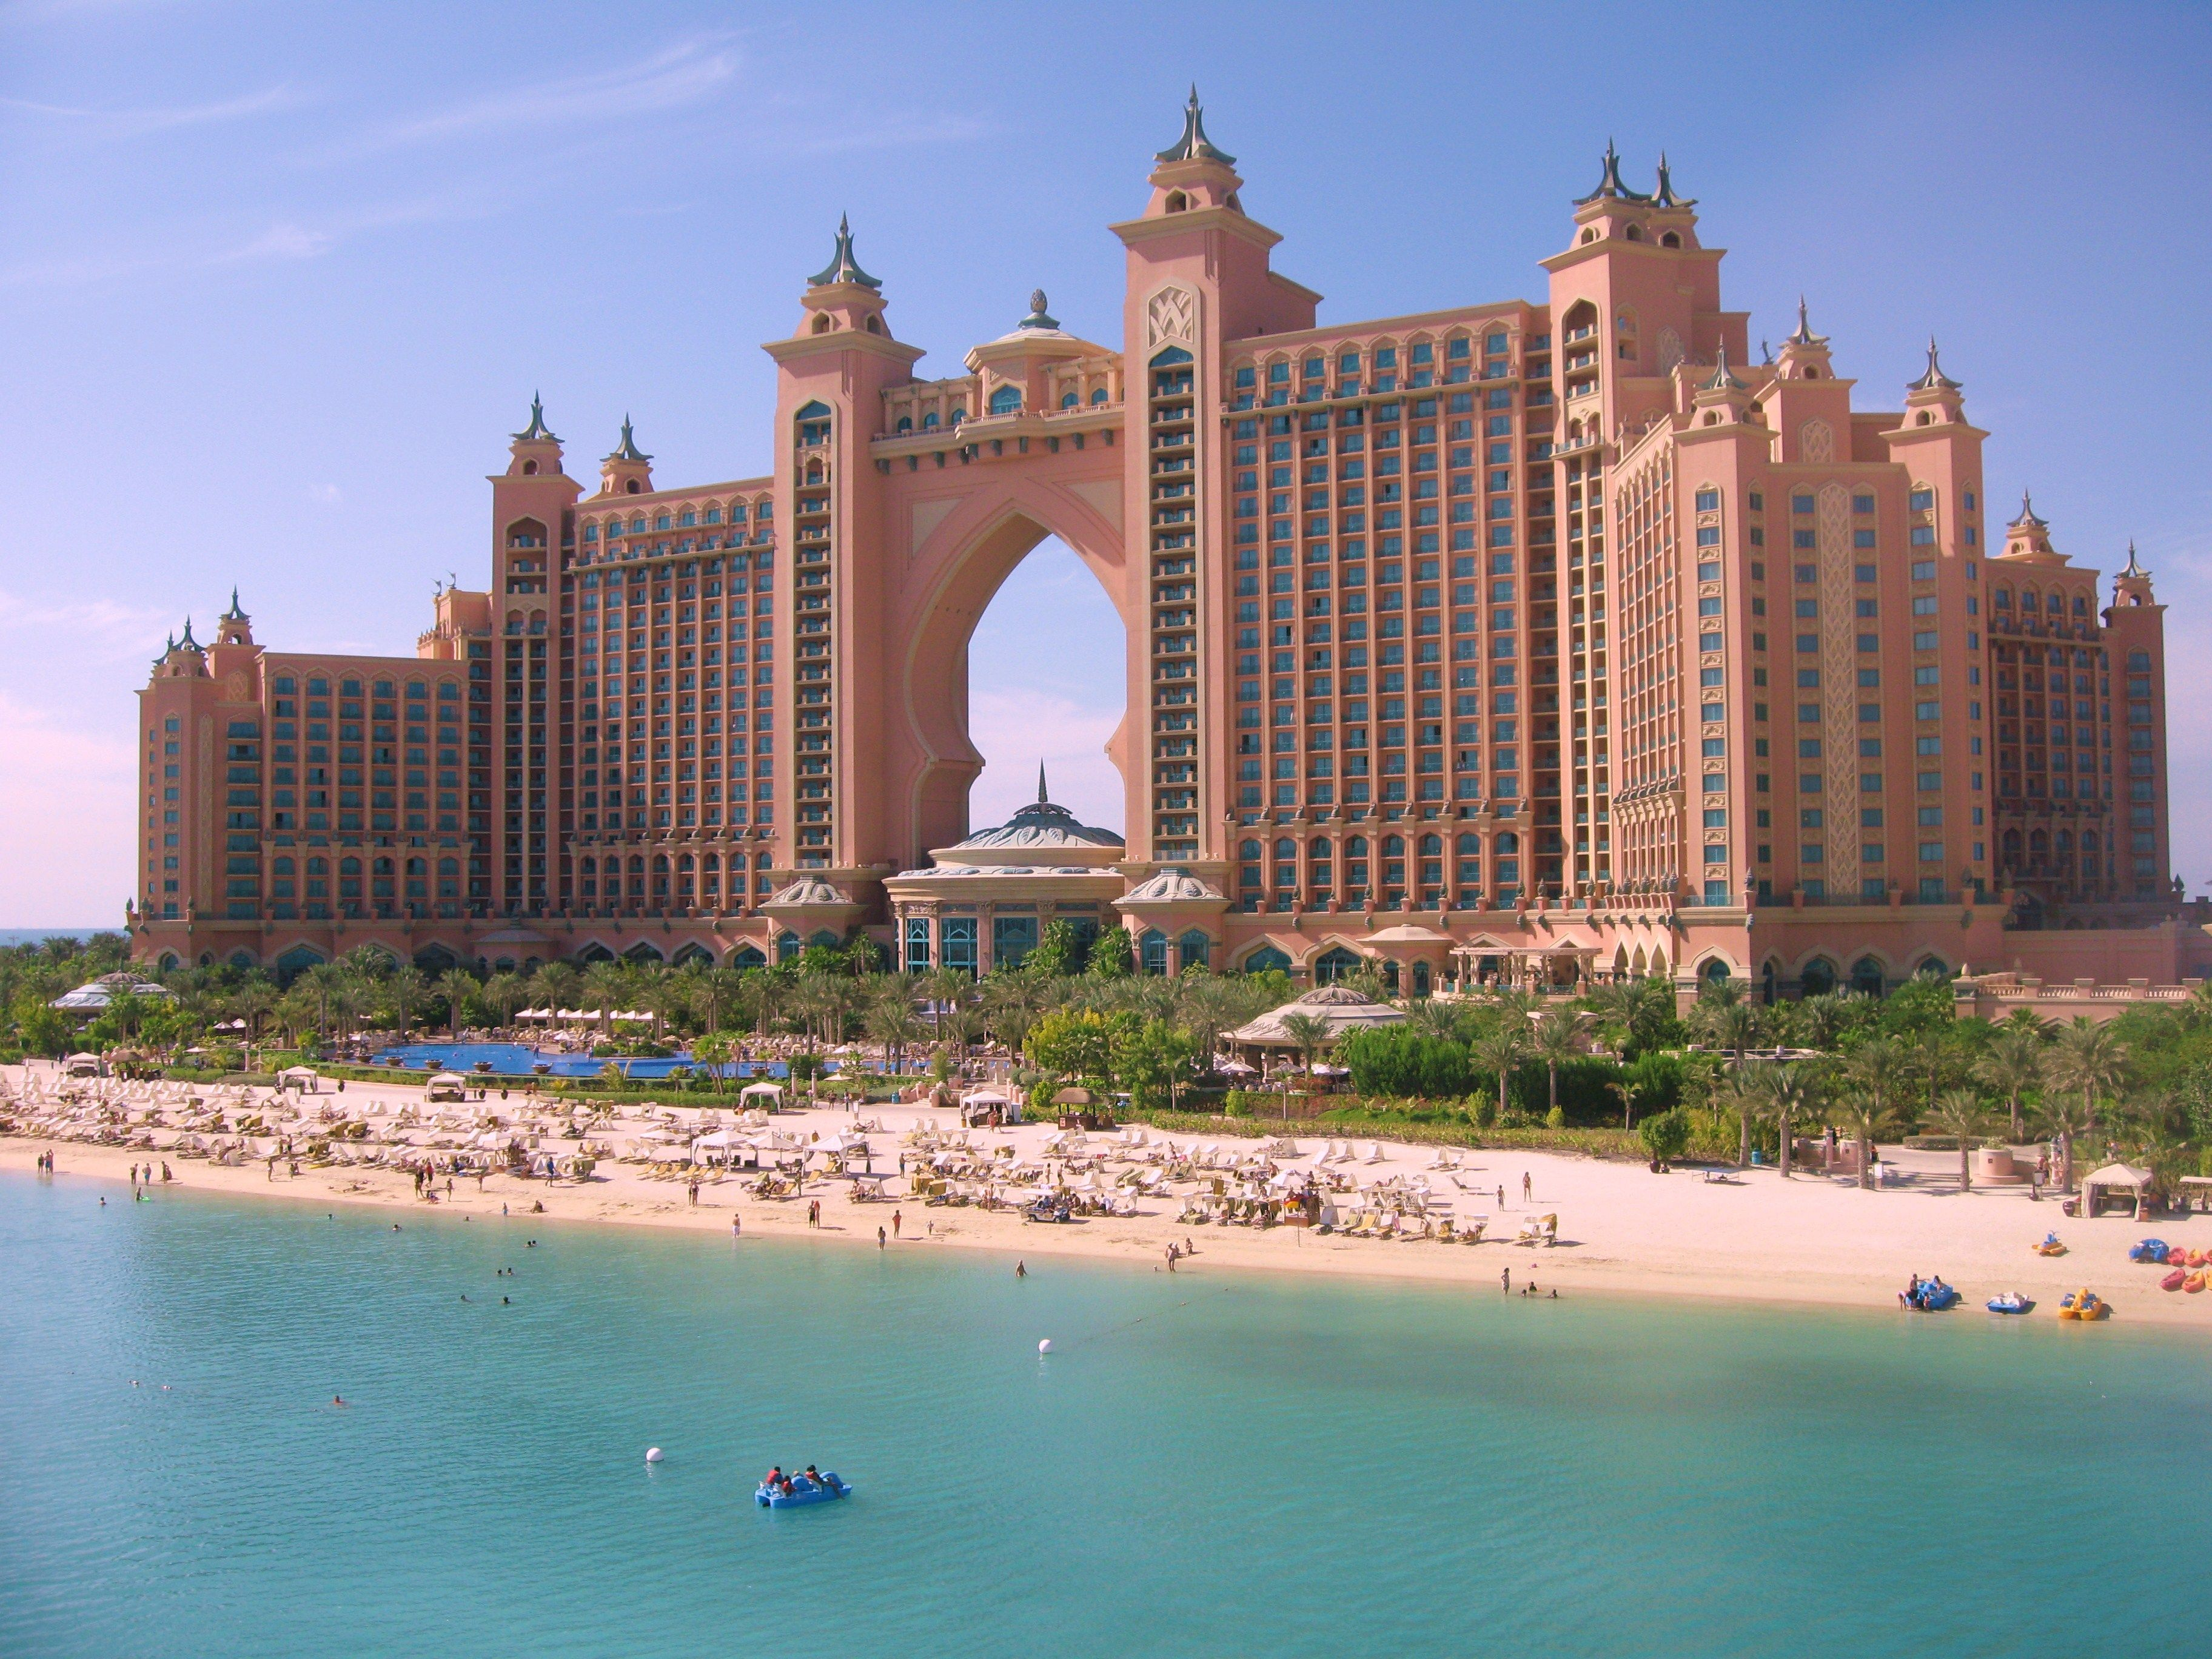 Imagini pentru Atlantis (Dubai, UAE)